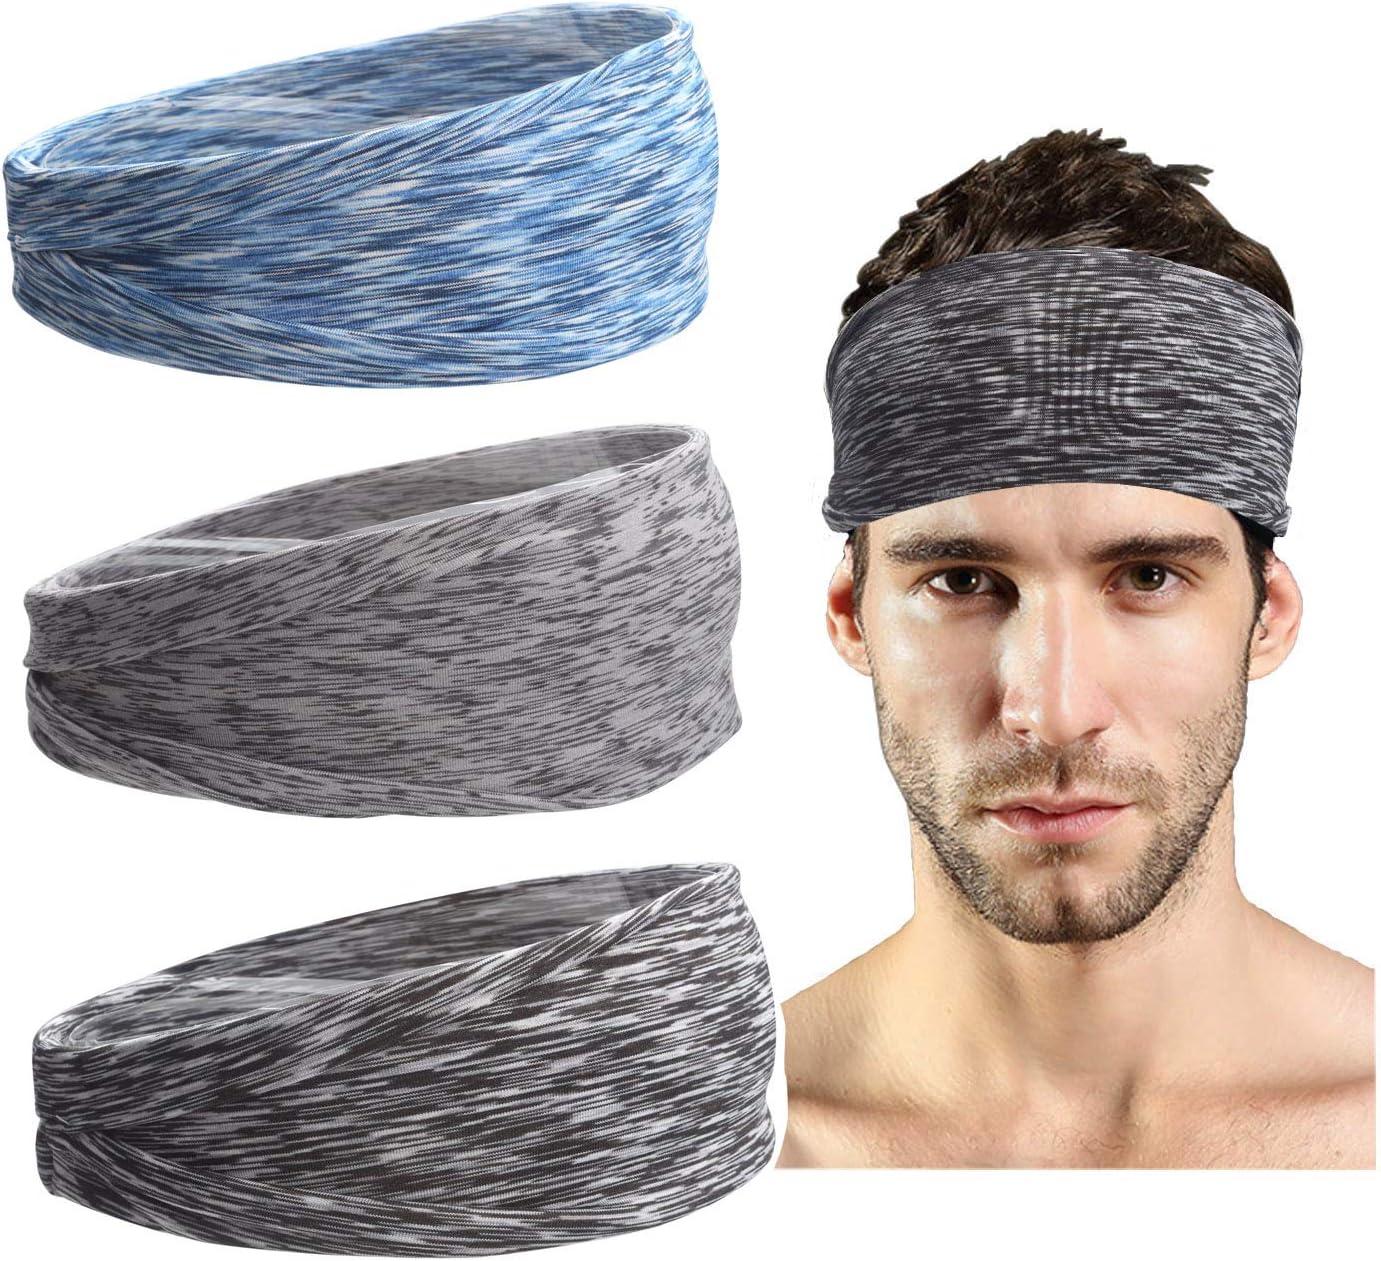 FYBLYCOO Headbands for Women Sweat Sport Yoga Running Moisture Wicking Headband for Womens Workout Hair Bands